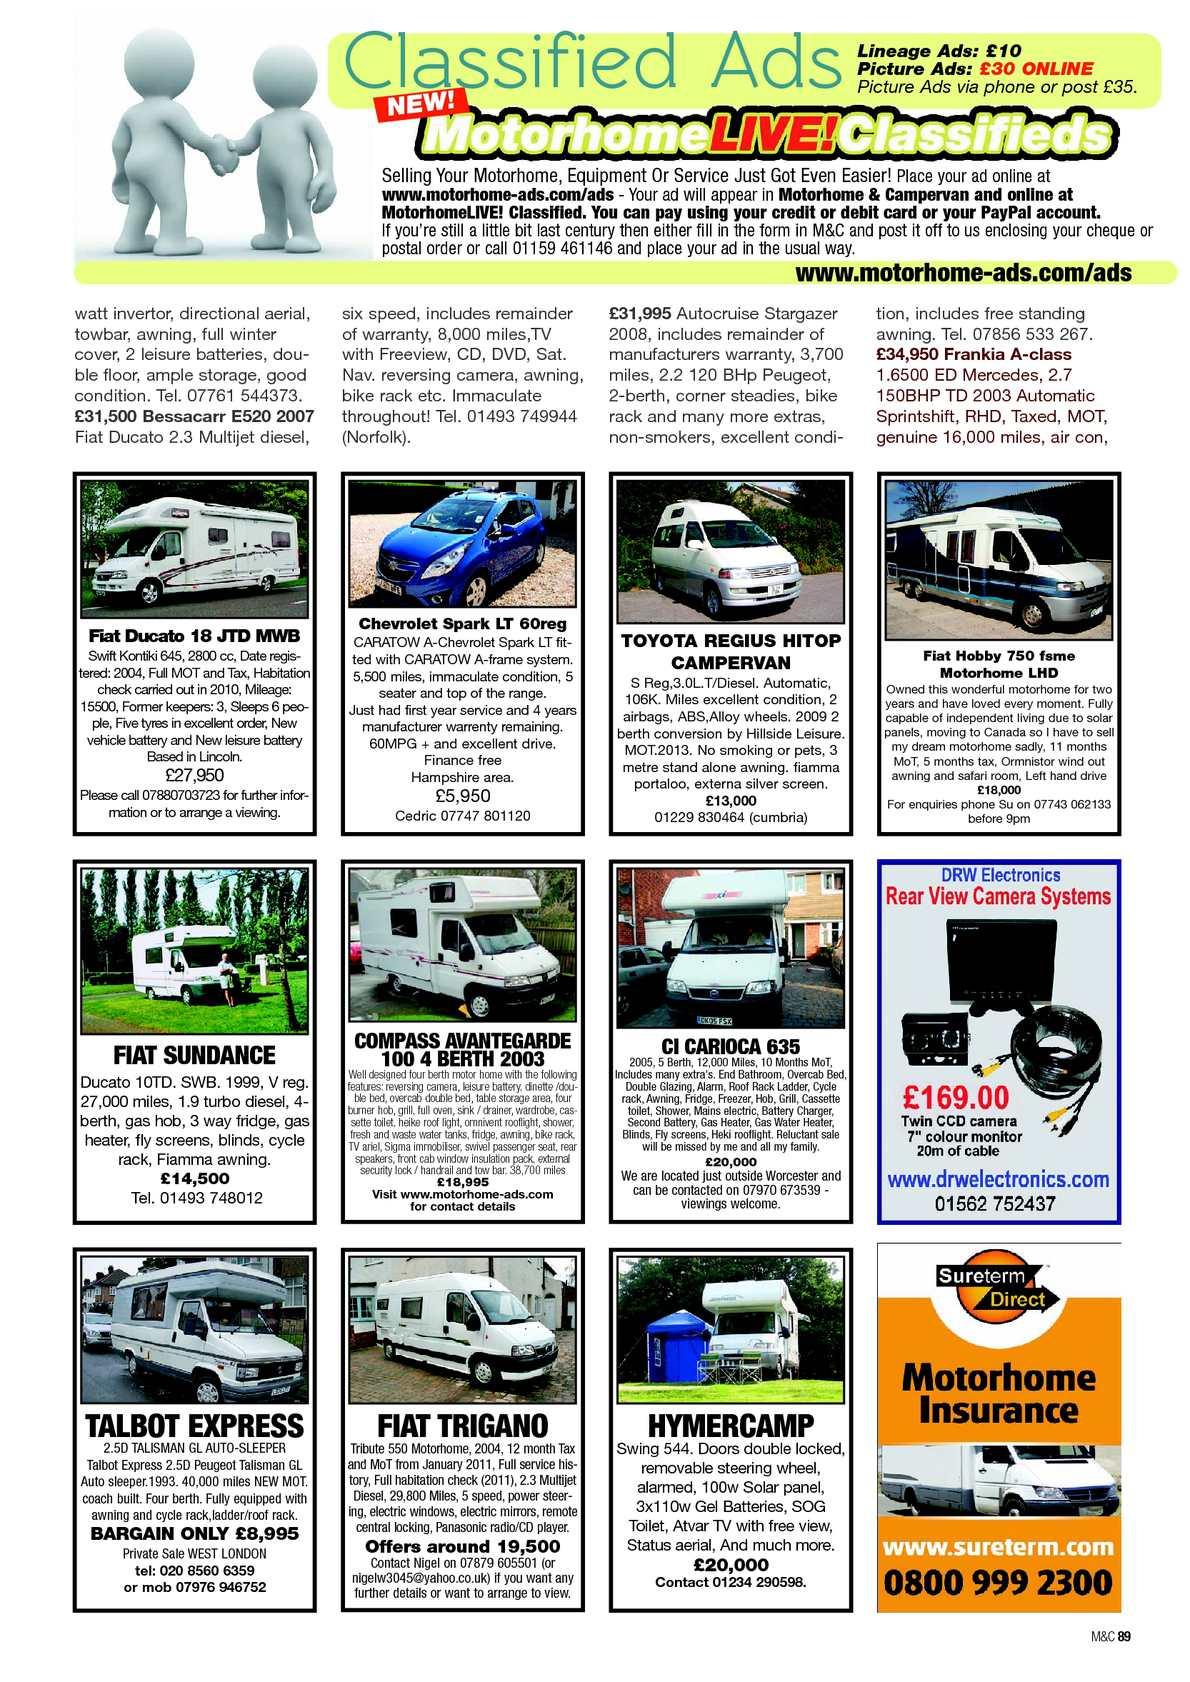 Feb 2013 motorhome campervan calameo downloader page 91 fandeluxe Gallery